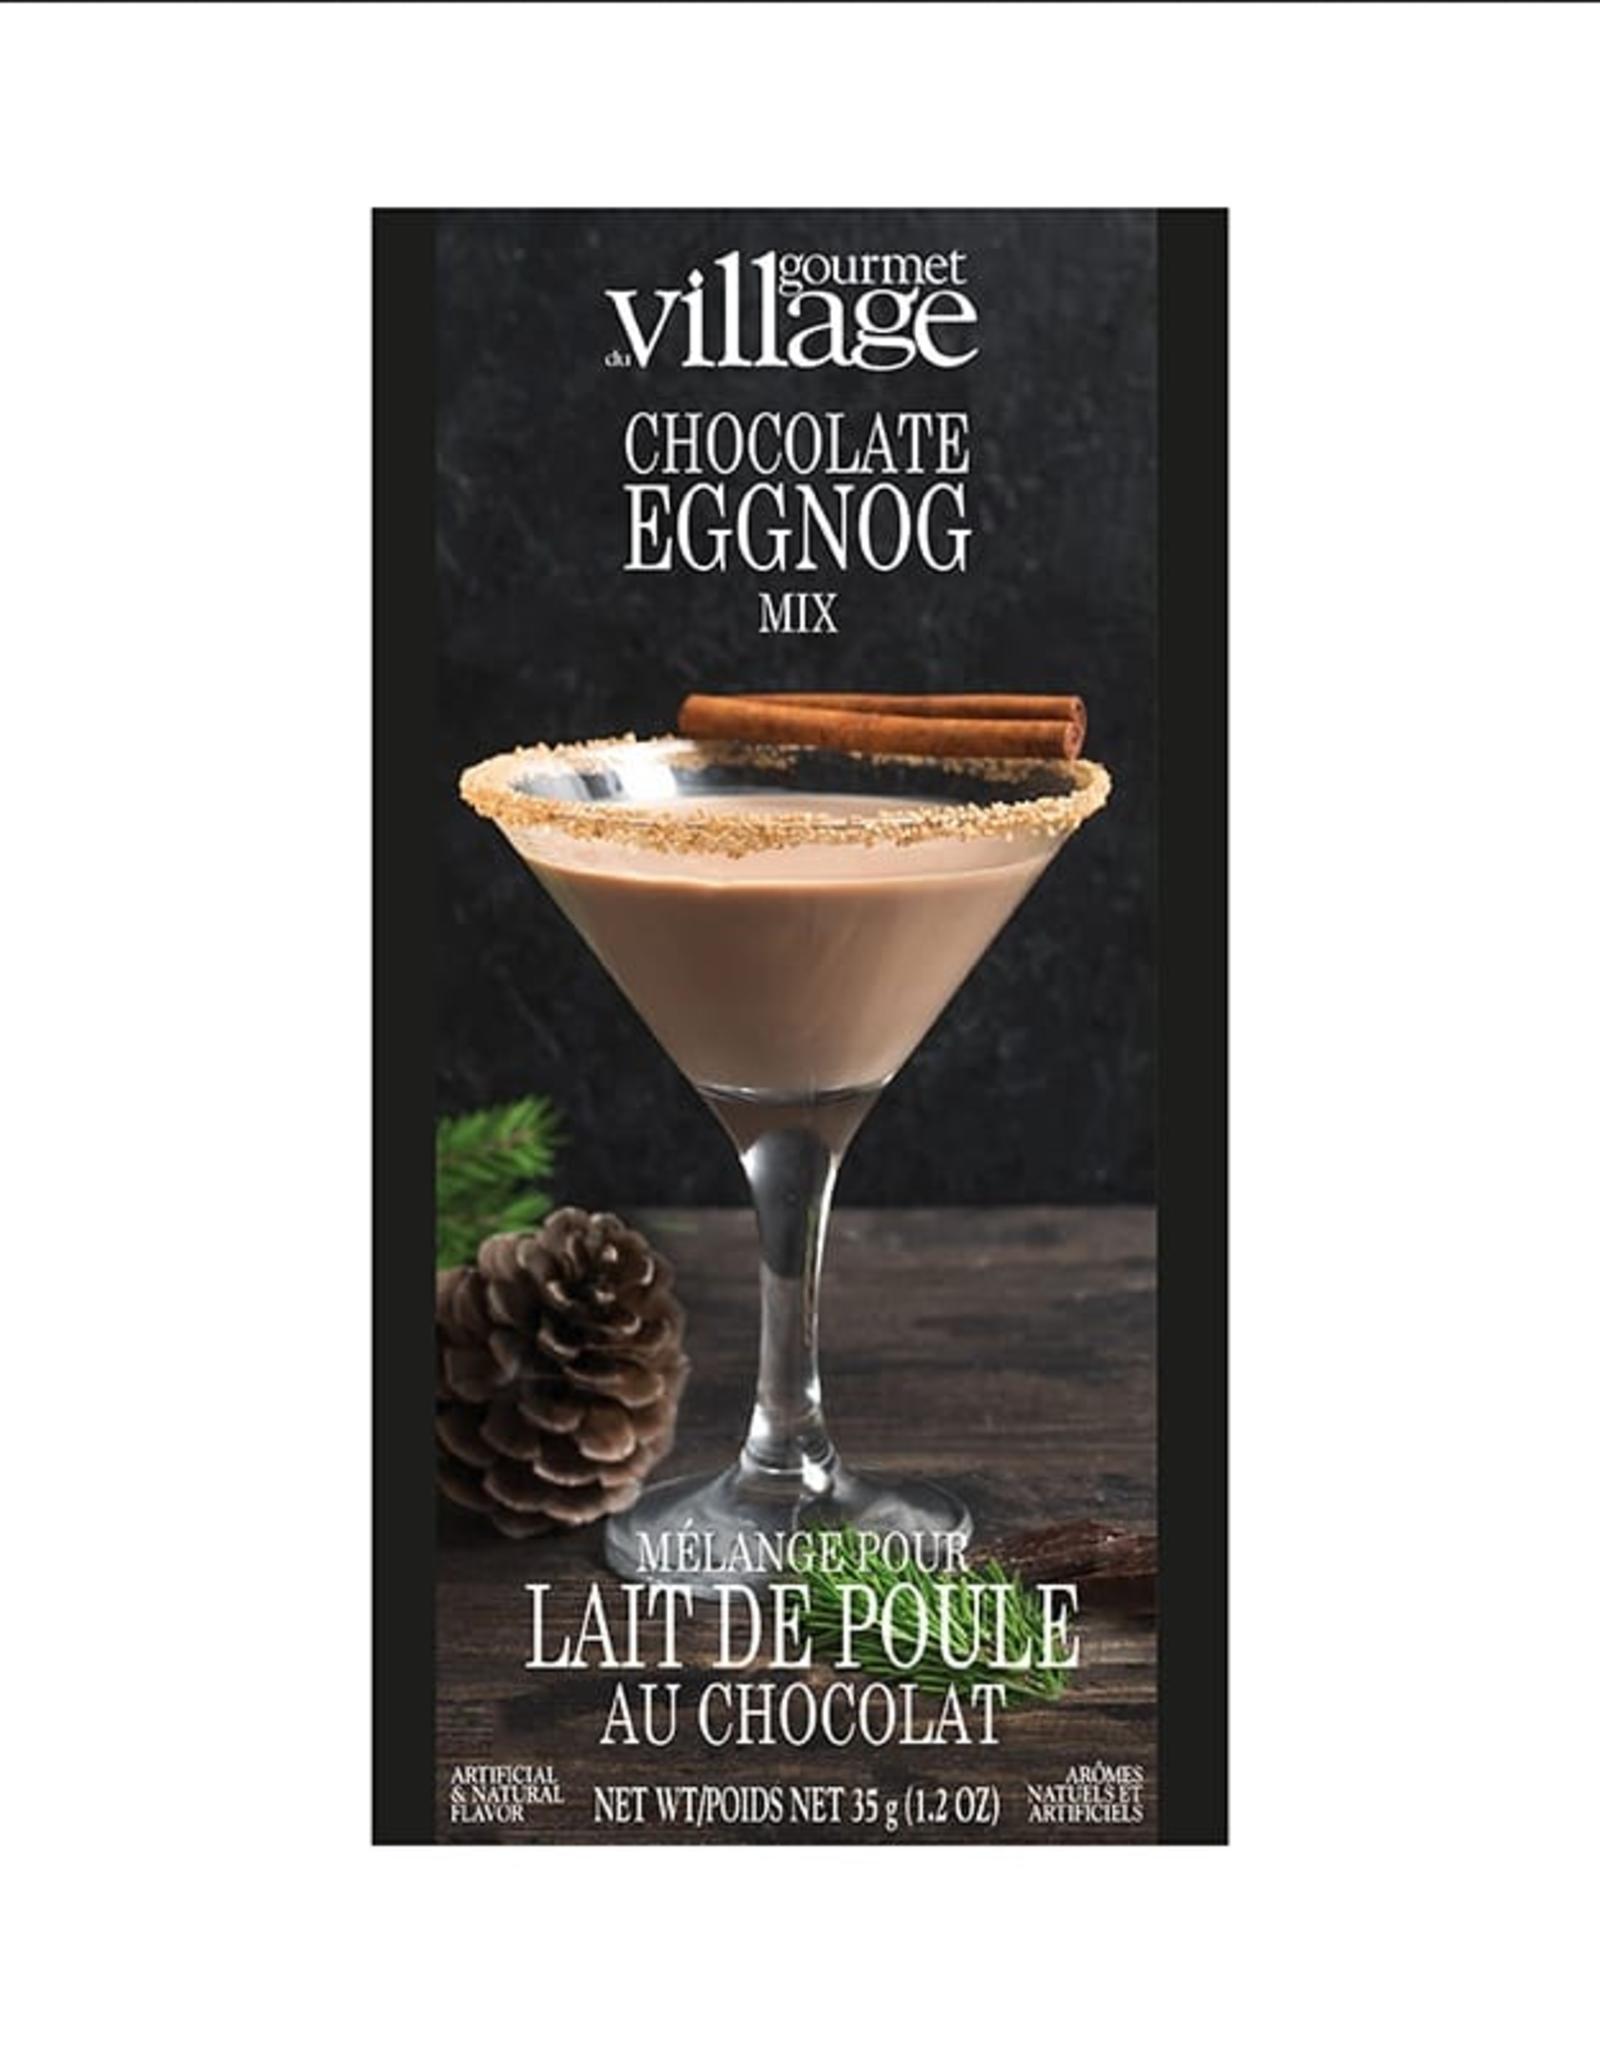 Gourmet Village Chocolate Eggnog Mix